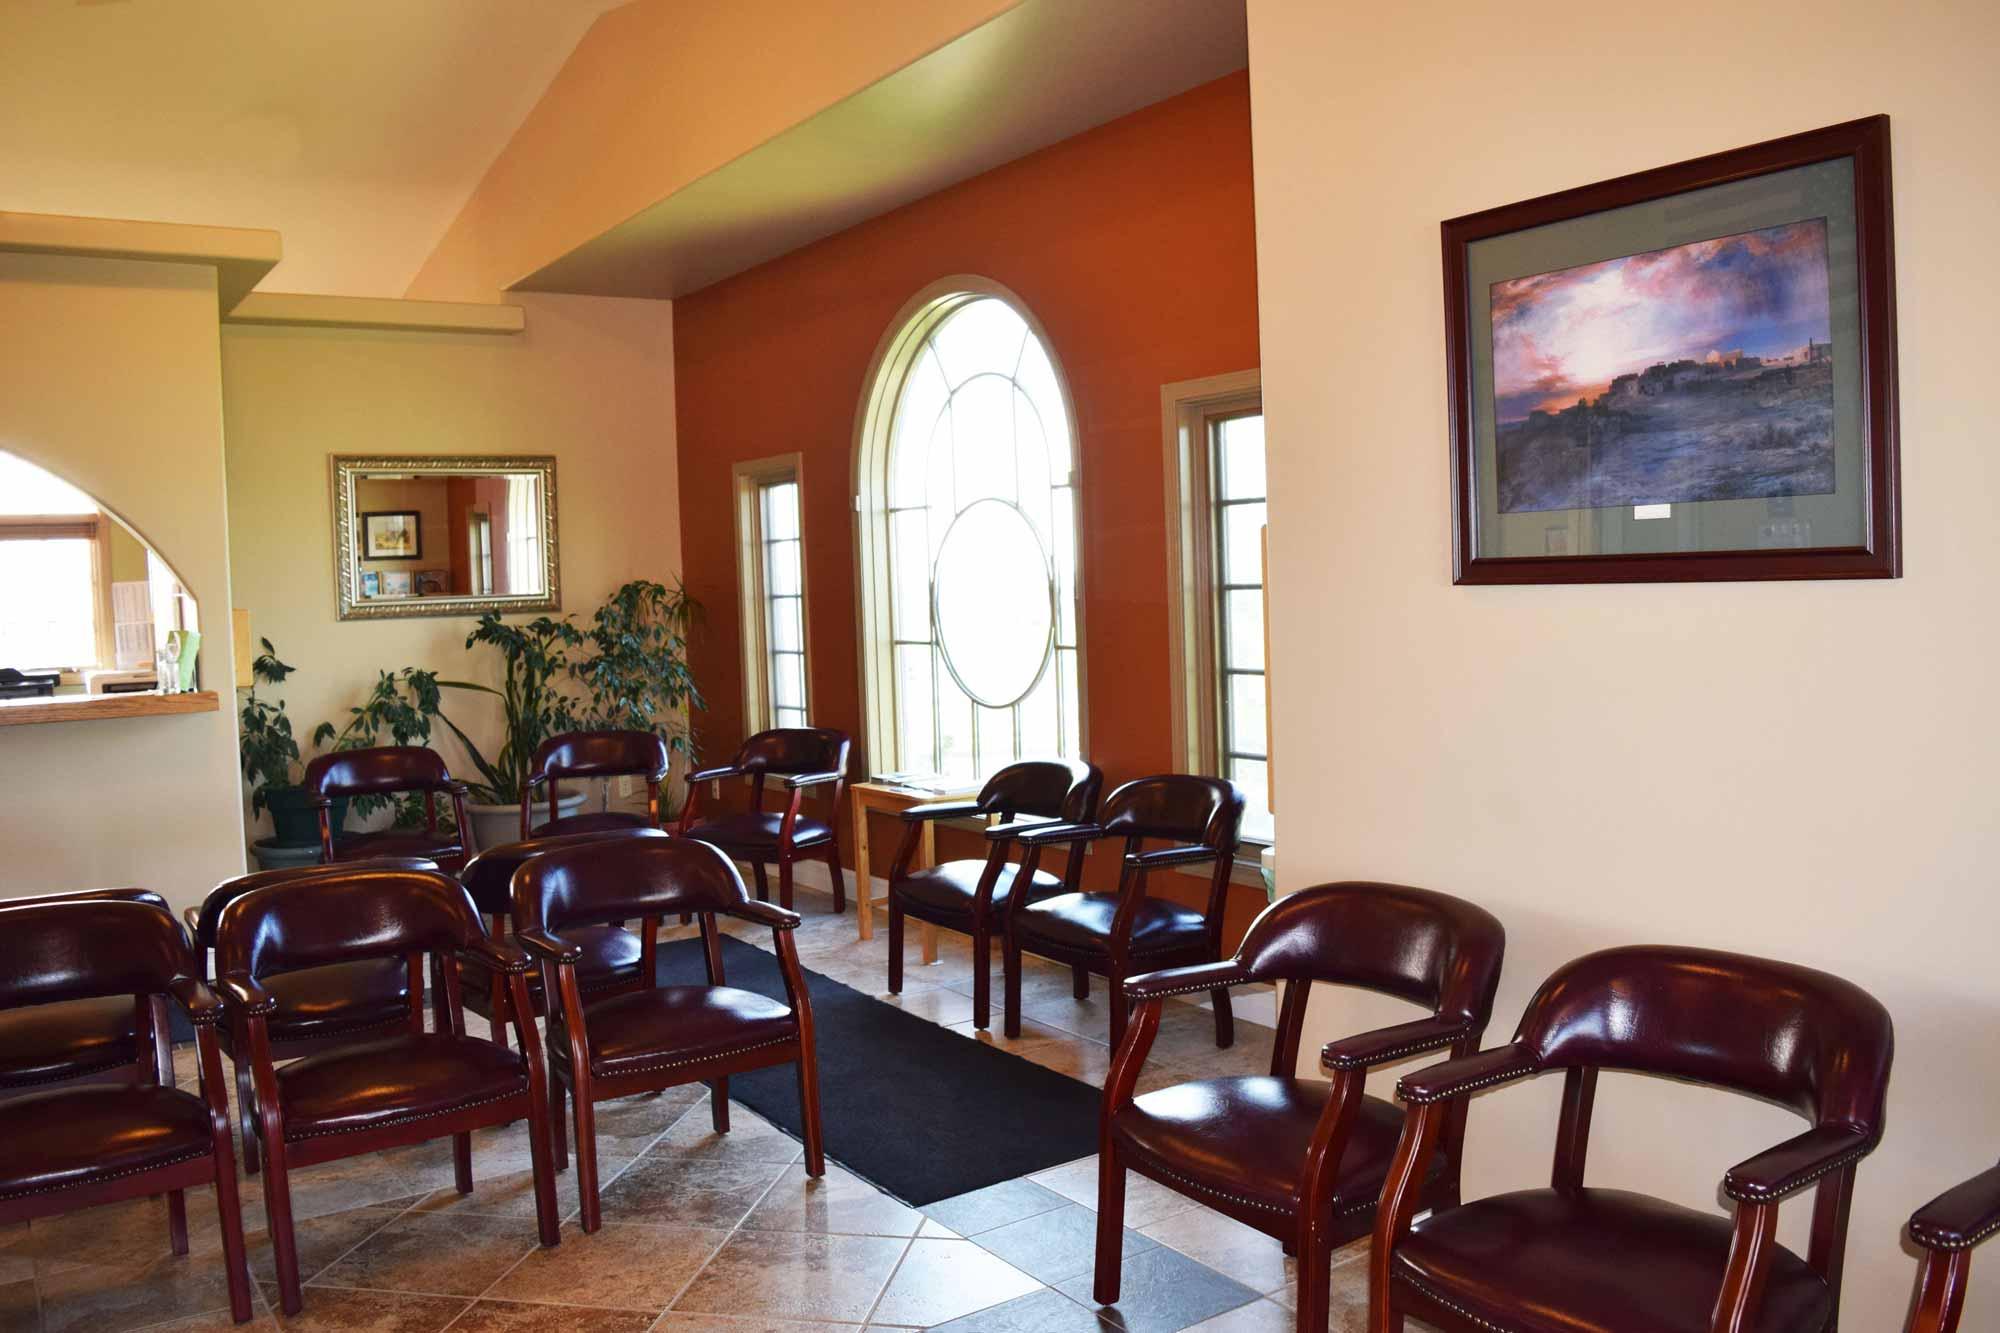 high-plains-surgical-associates-building-waiting-room.jpg